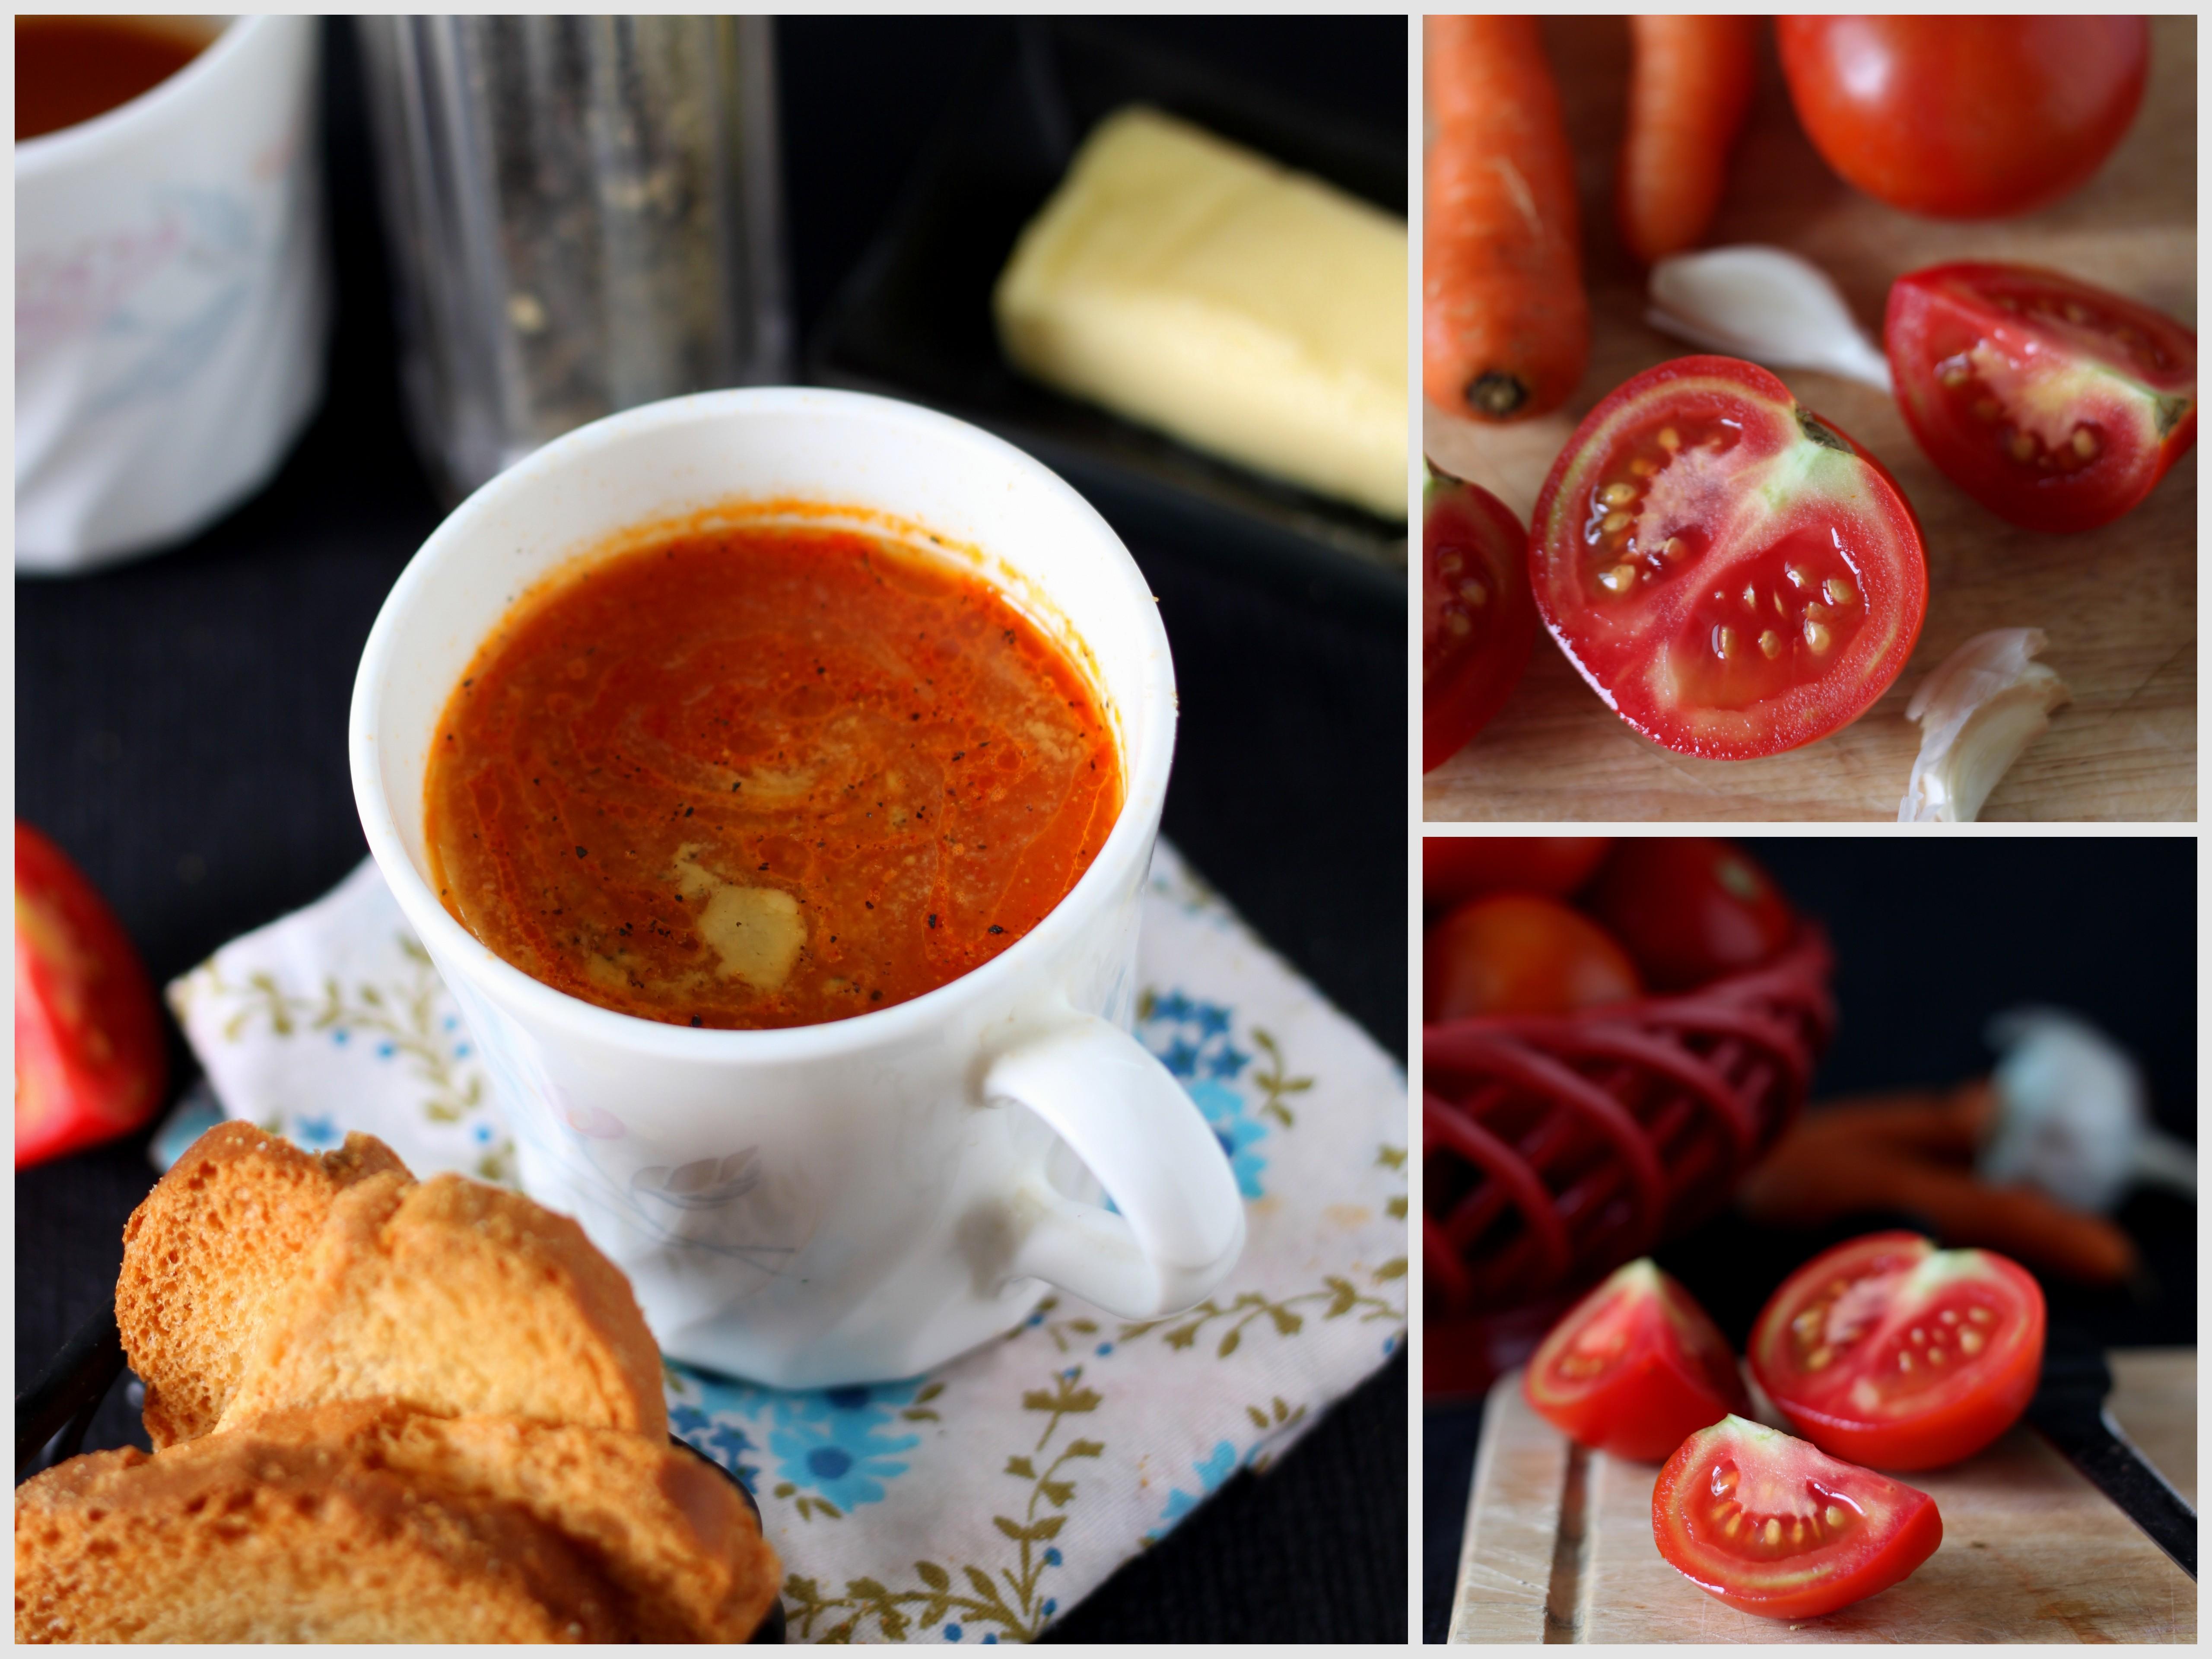 Tomato Soup India Indian-style Hot Tomato Soup